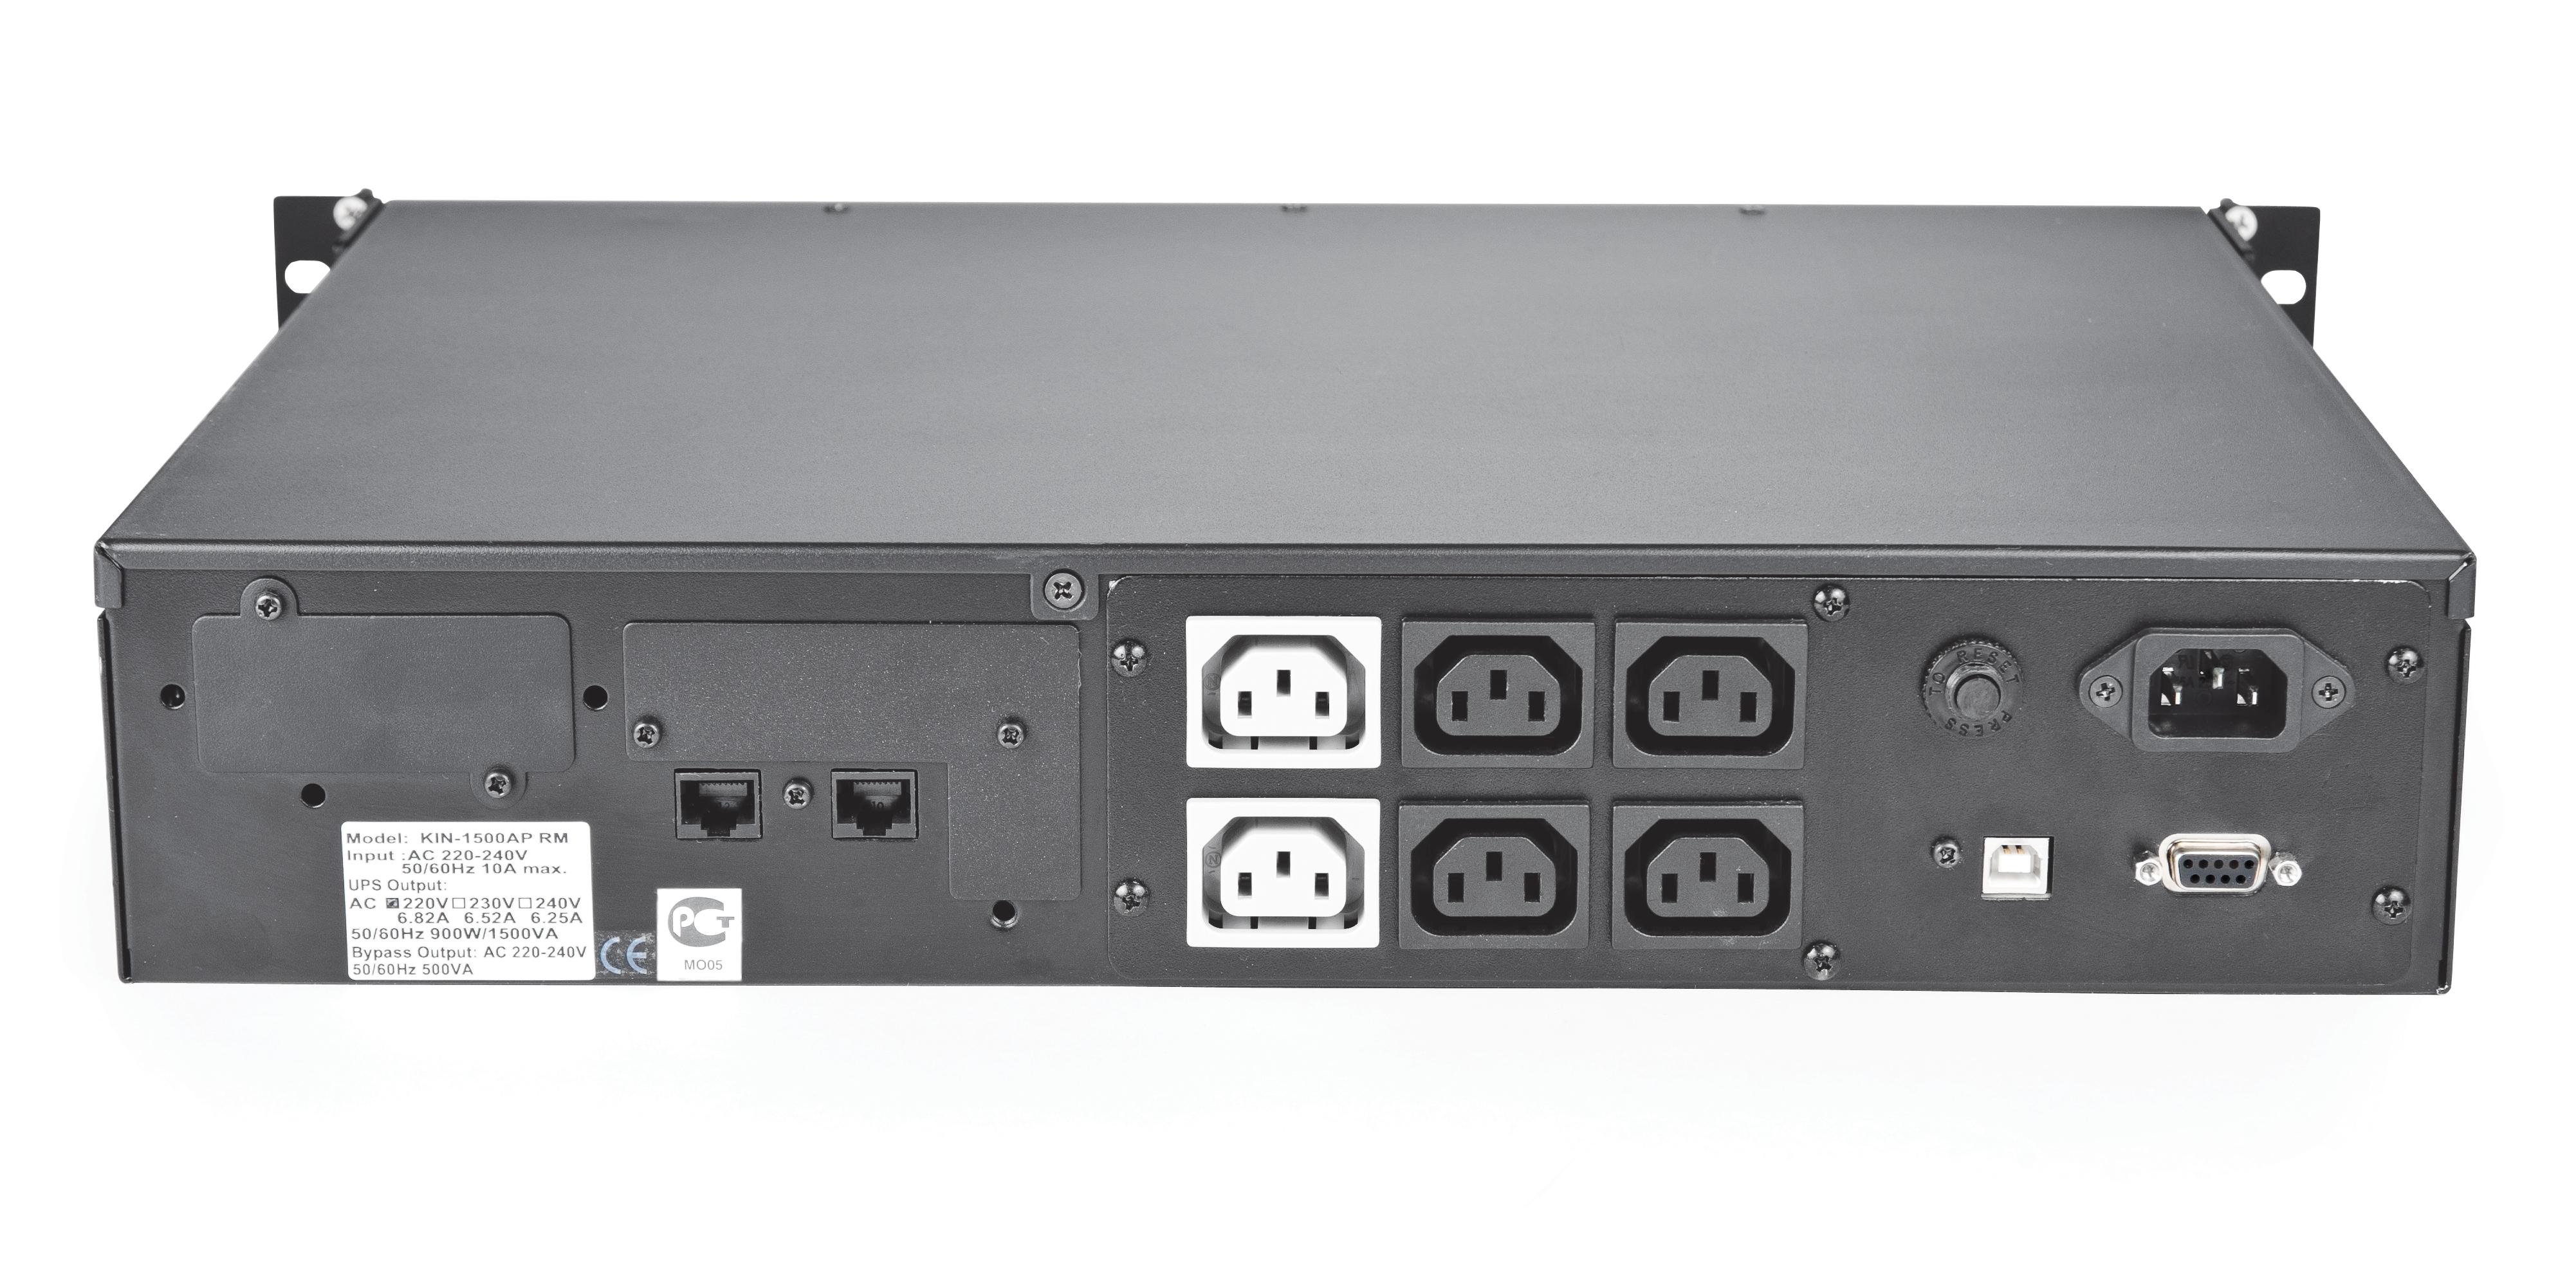 ИБП Powercom KIN-1200AP RM 1200VA/720W 2U,USB,RS-232 (4+2 IEC)* ибп powercom kin 1200ap rm2u 1200va черный